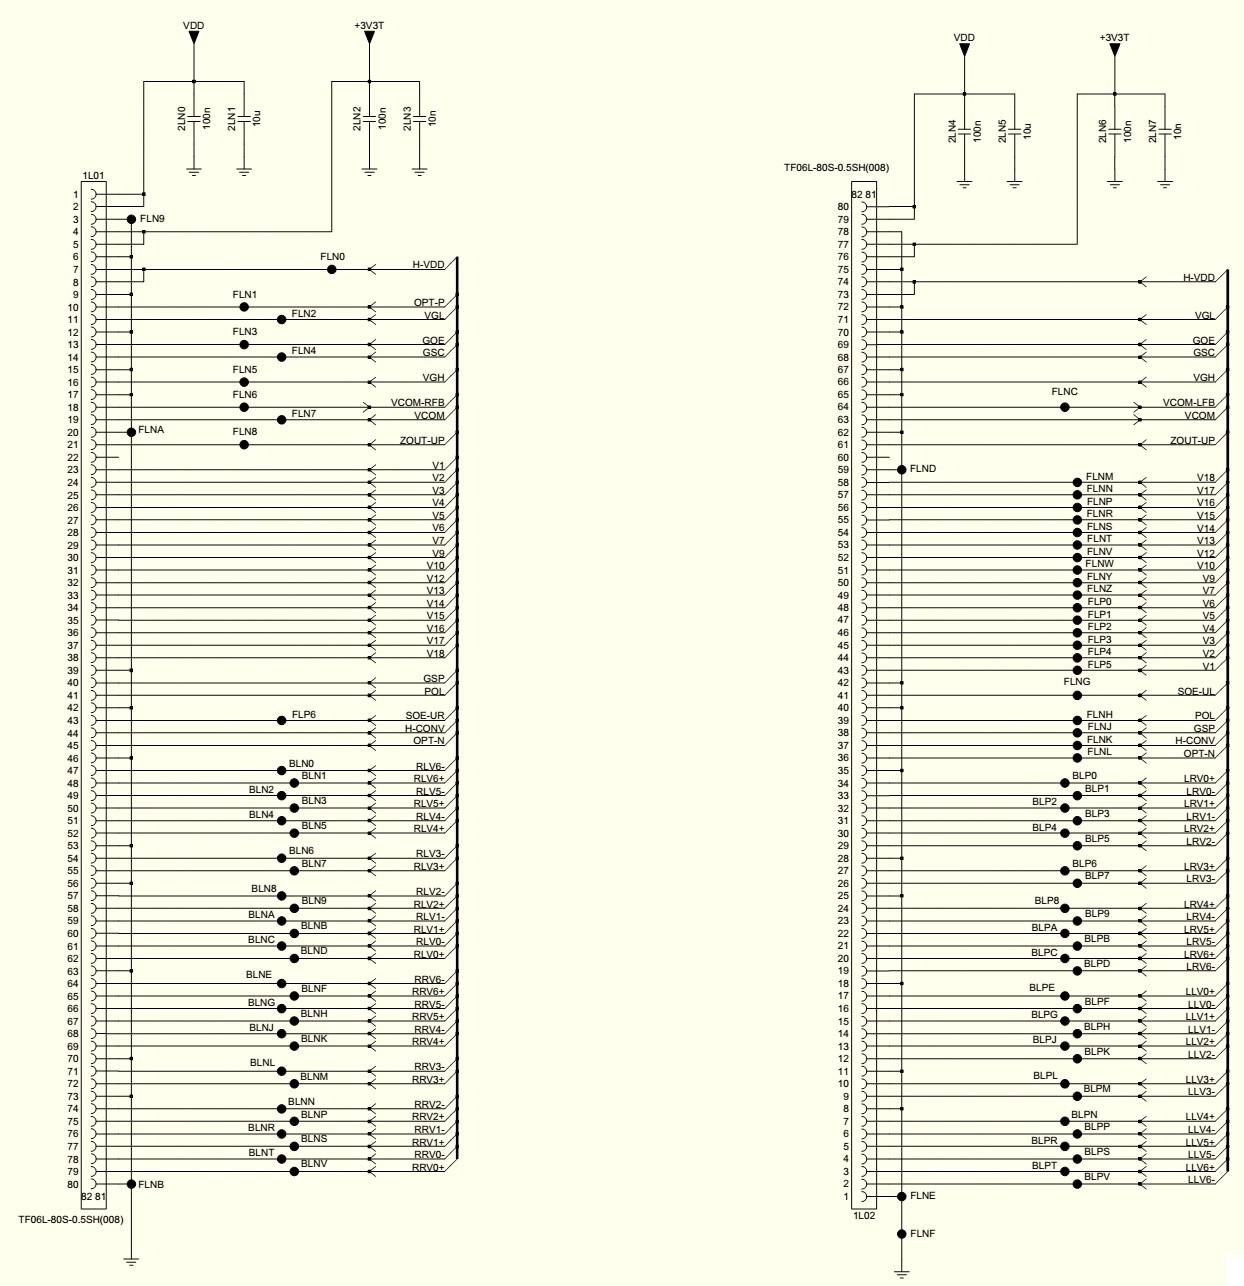 led tv schematic tcon board schematic or wiring diagram weekt con board block diagram manual e [ 1244 x 1286 Pixel ]